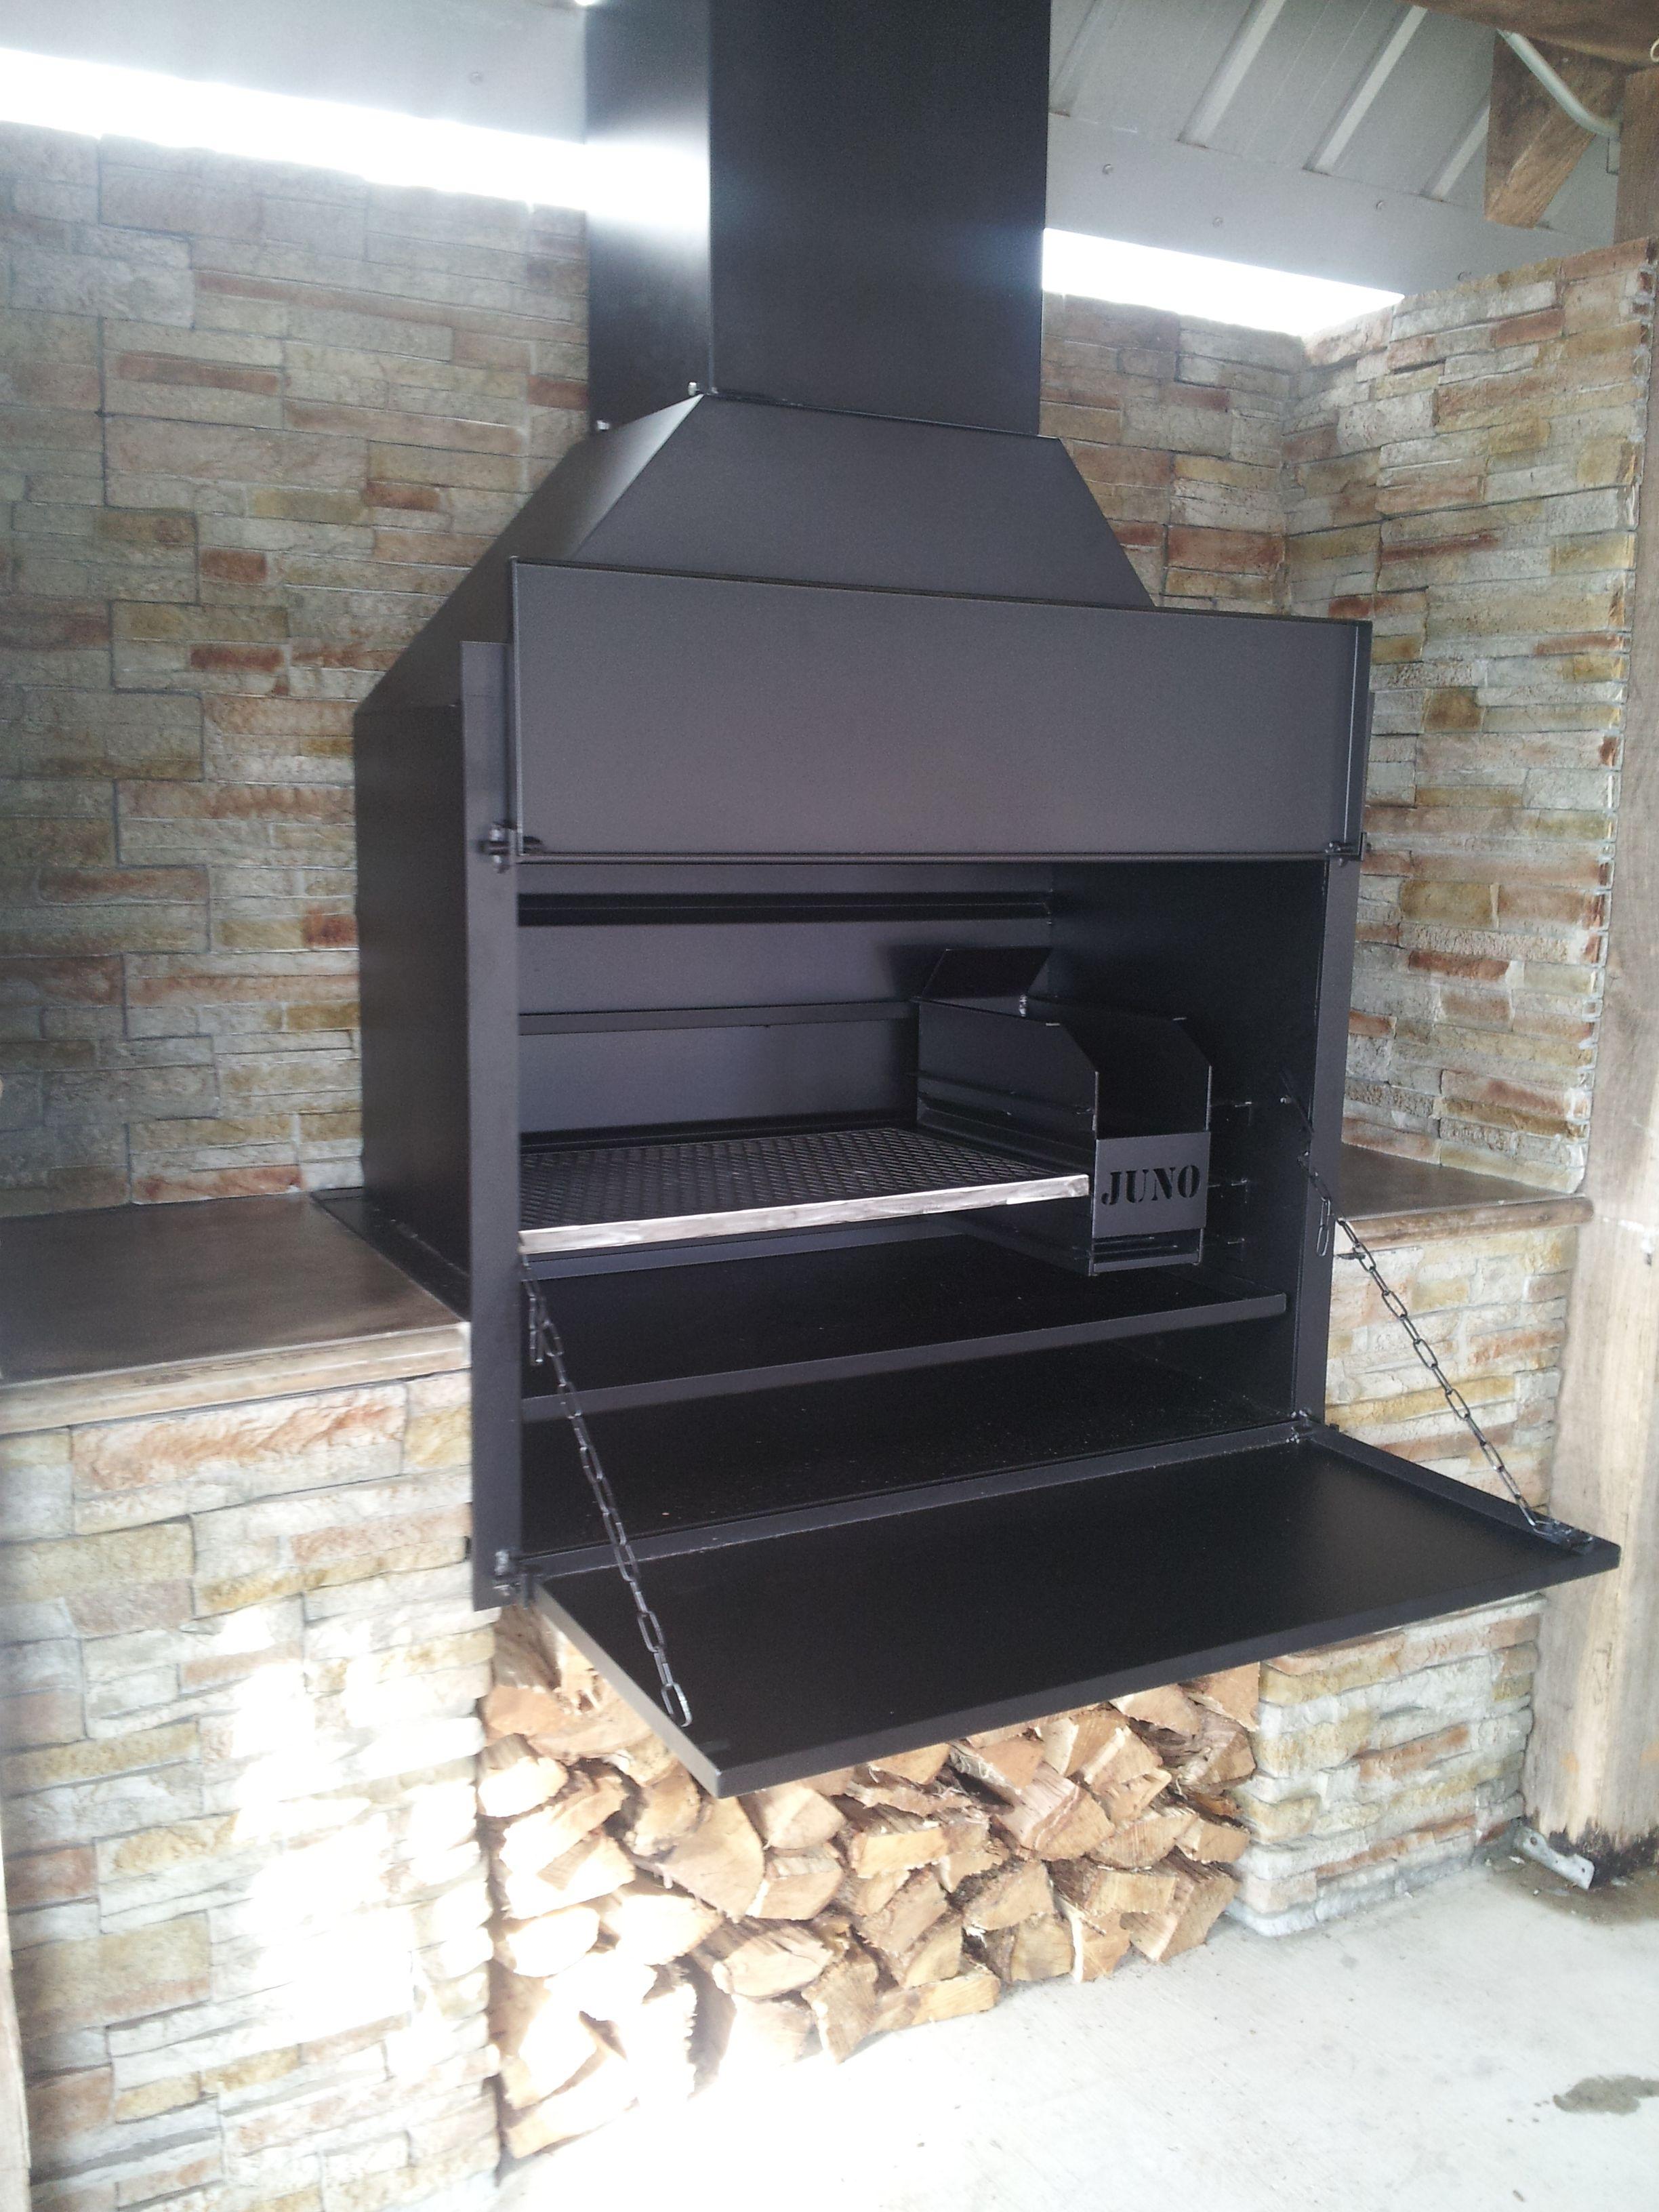 Juno Grill and fireplace  Outdoor küche, Garten grillen, Garten küche